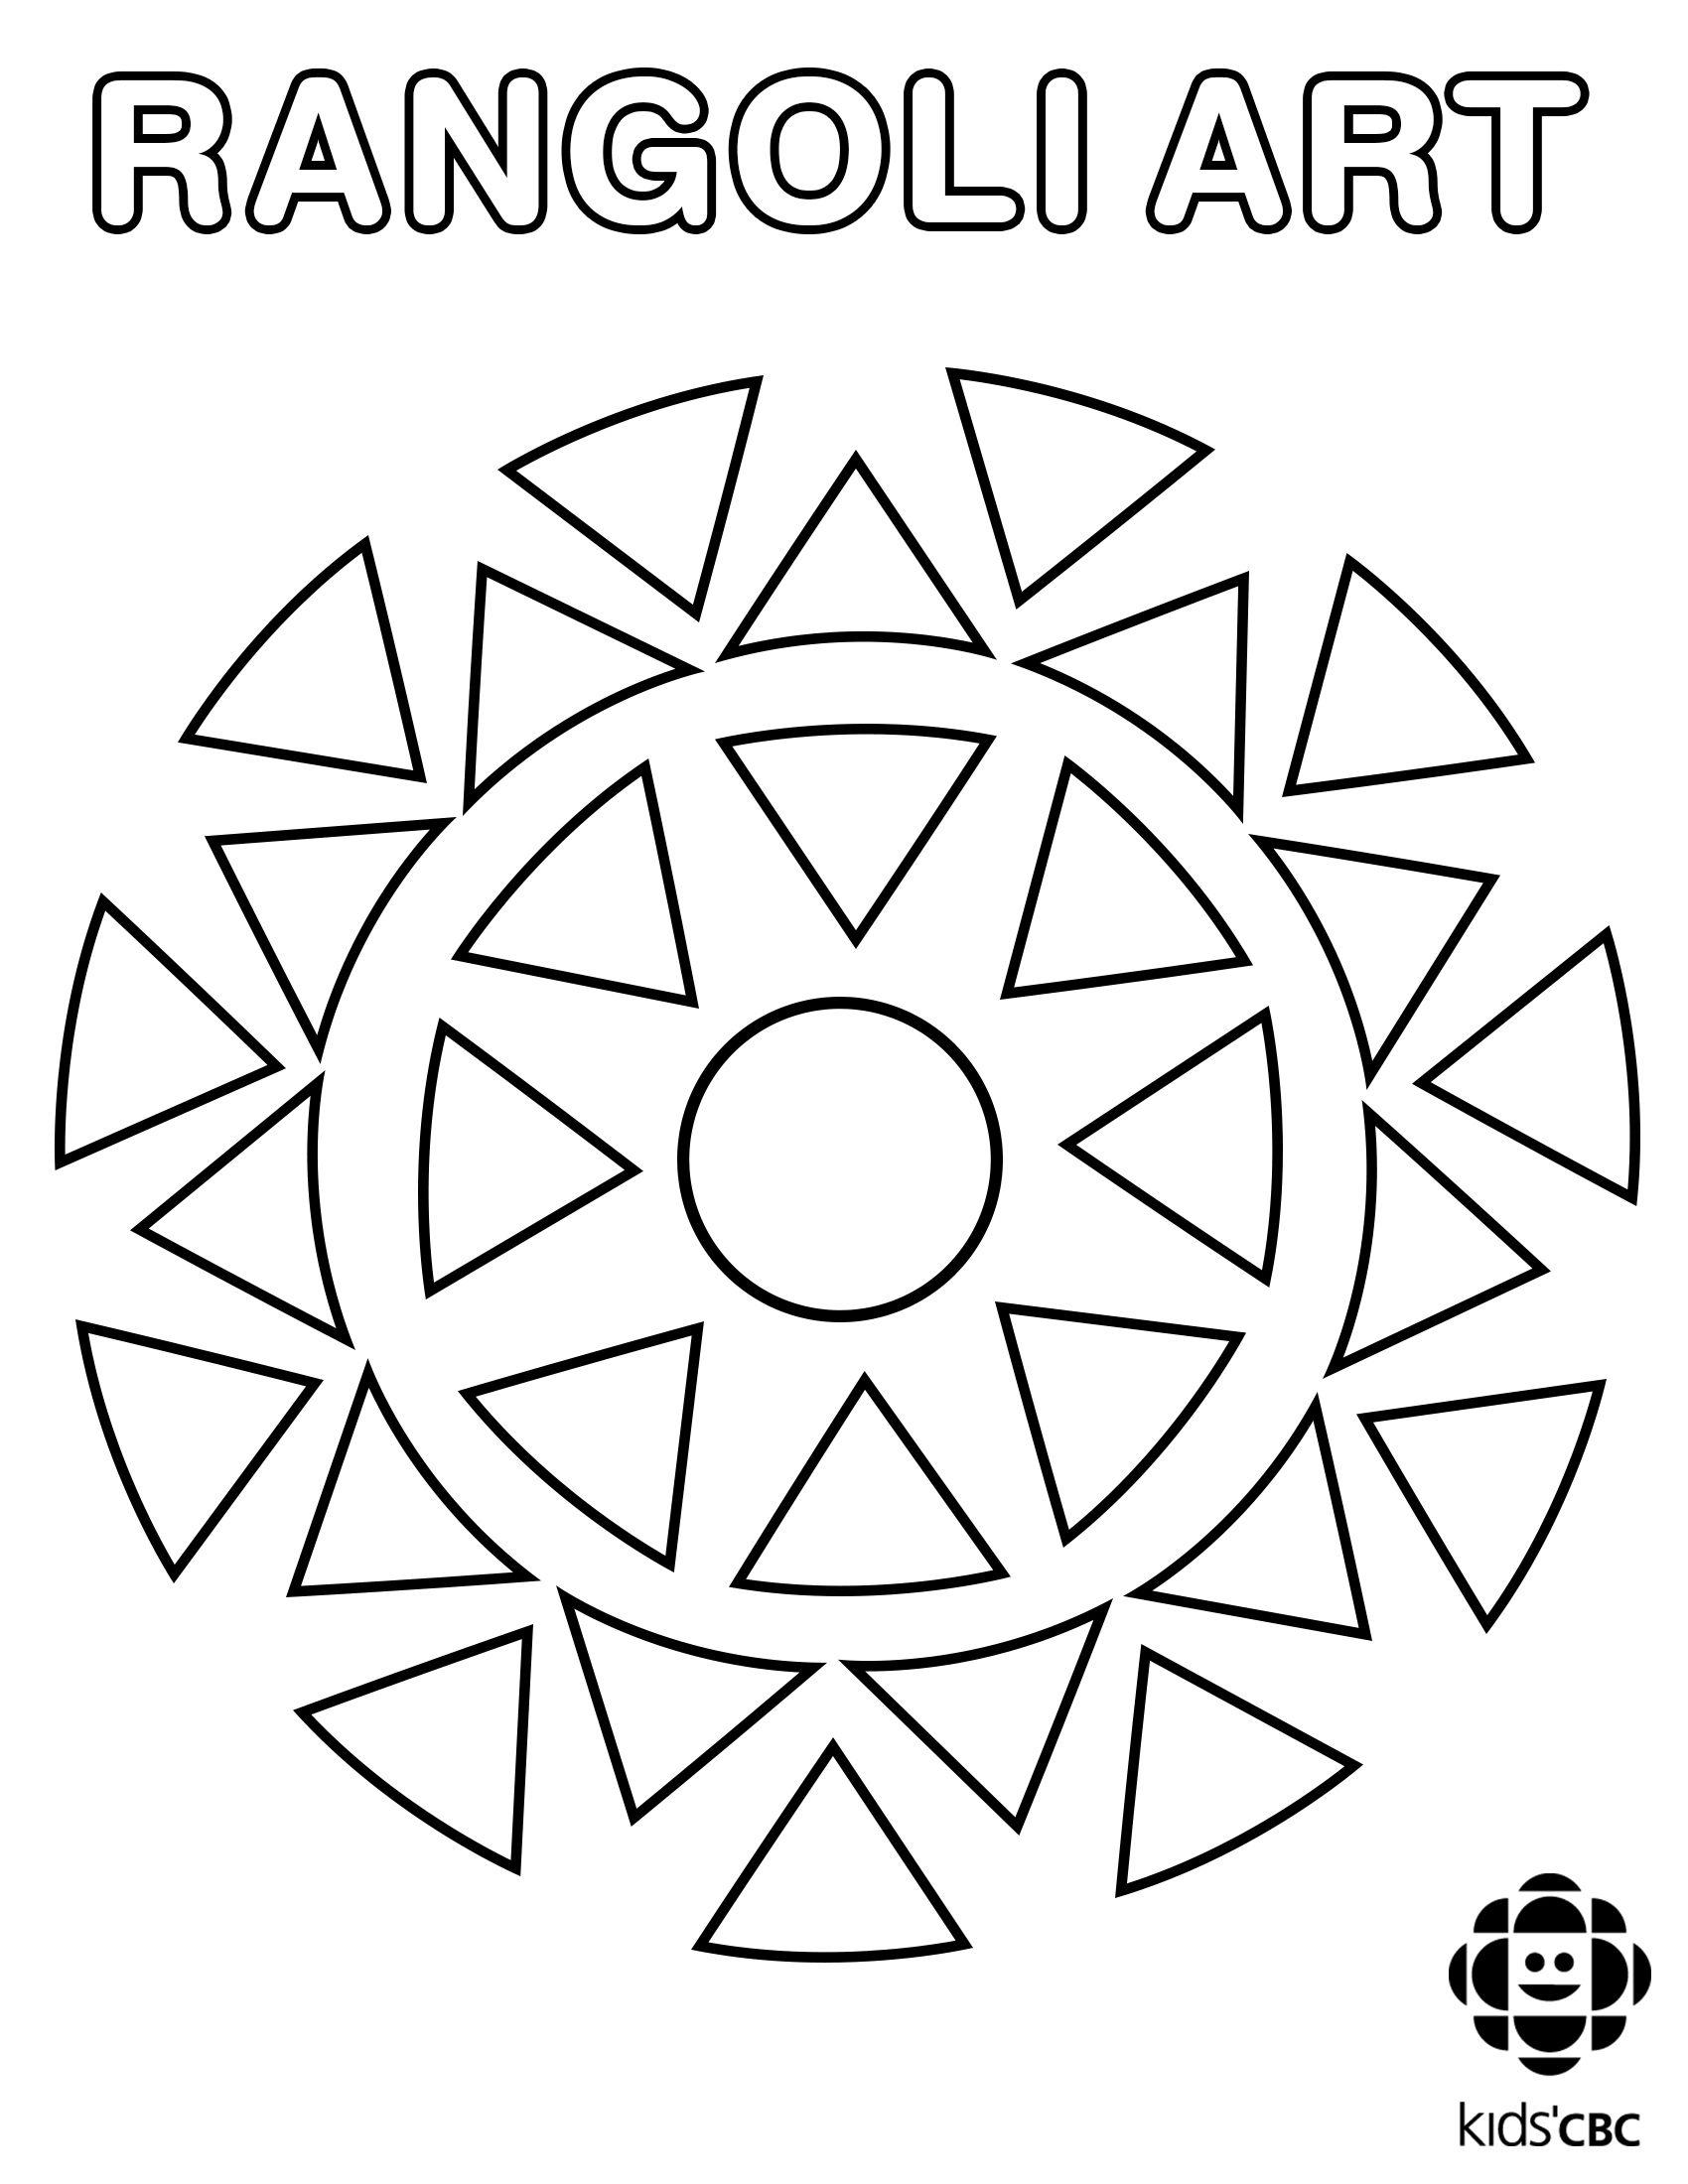 Image Result For Rangoli Patterns Black And White